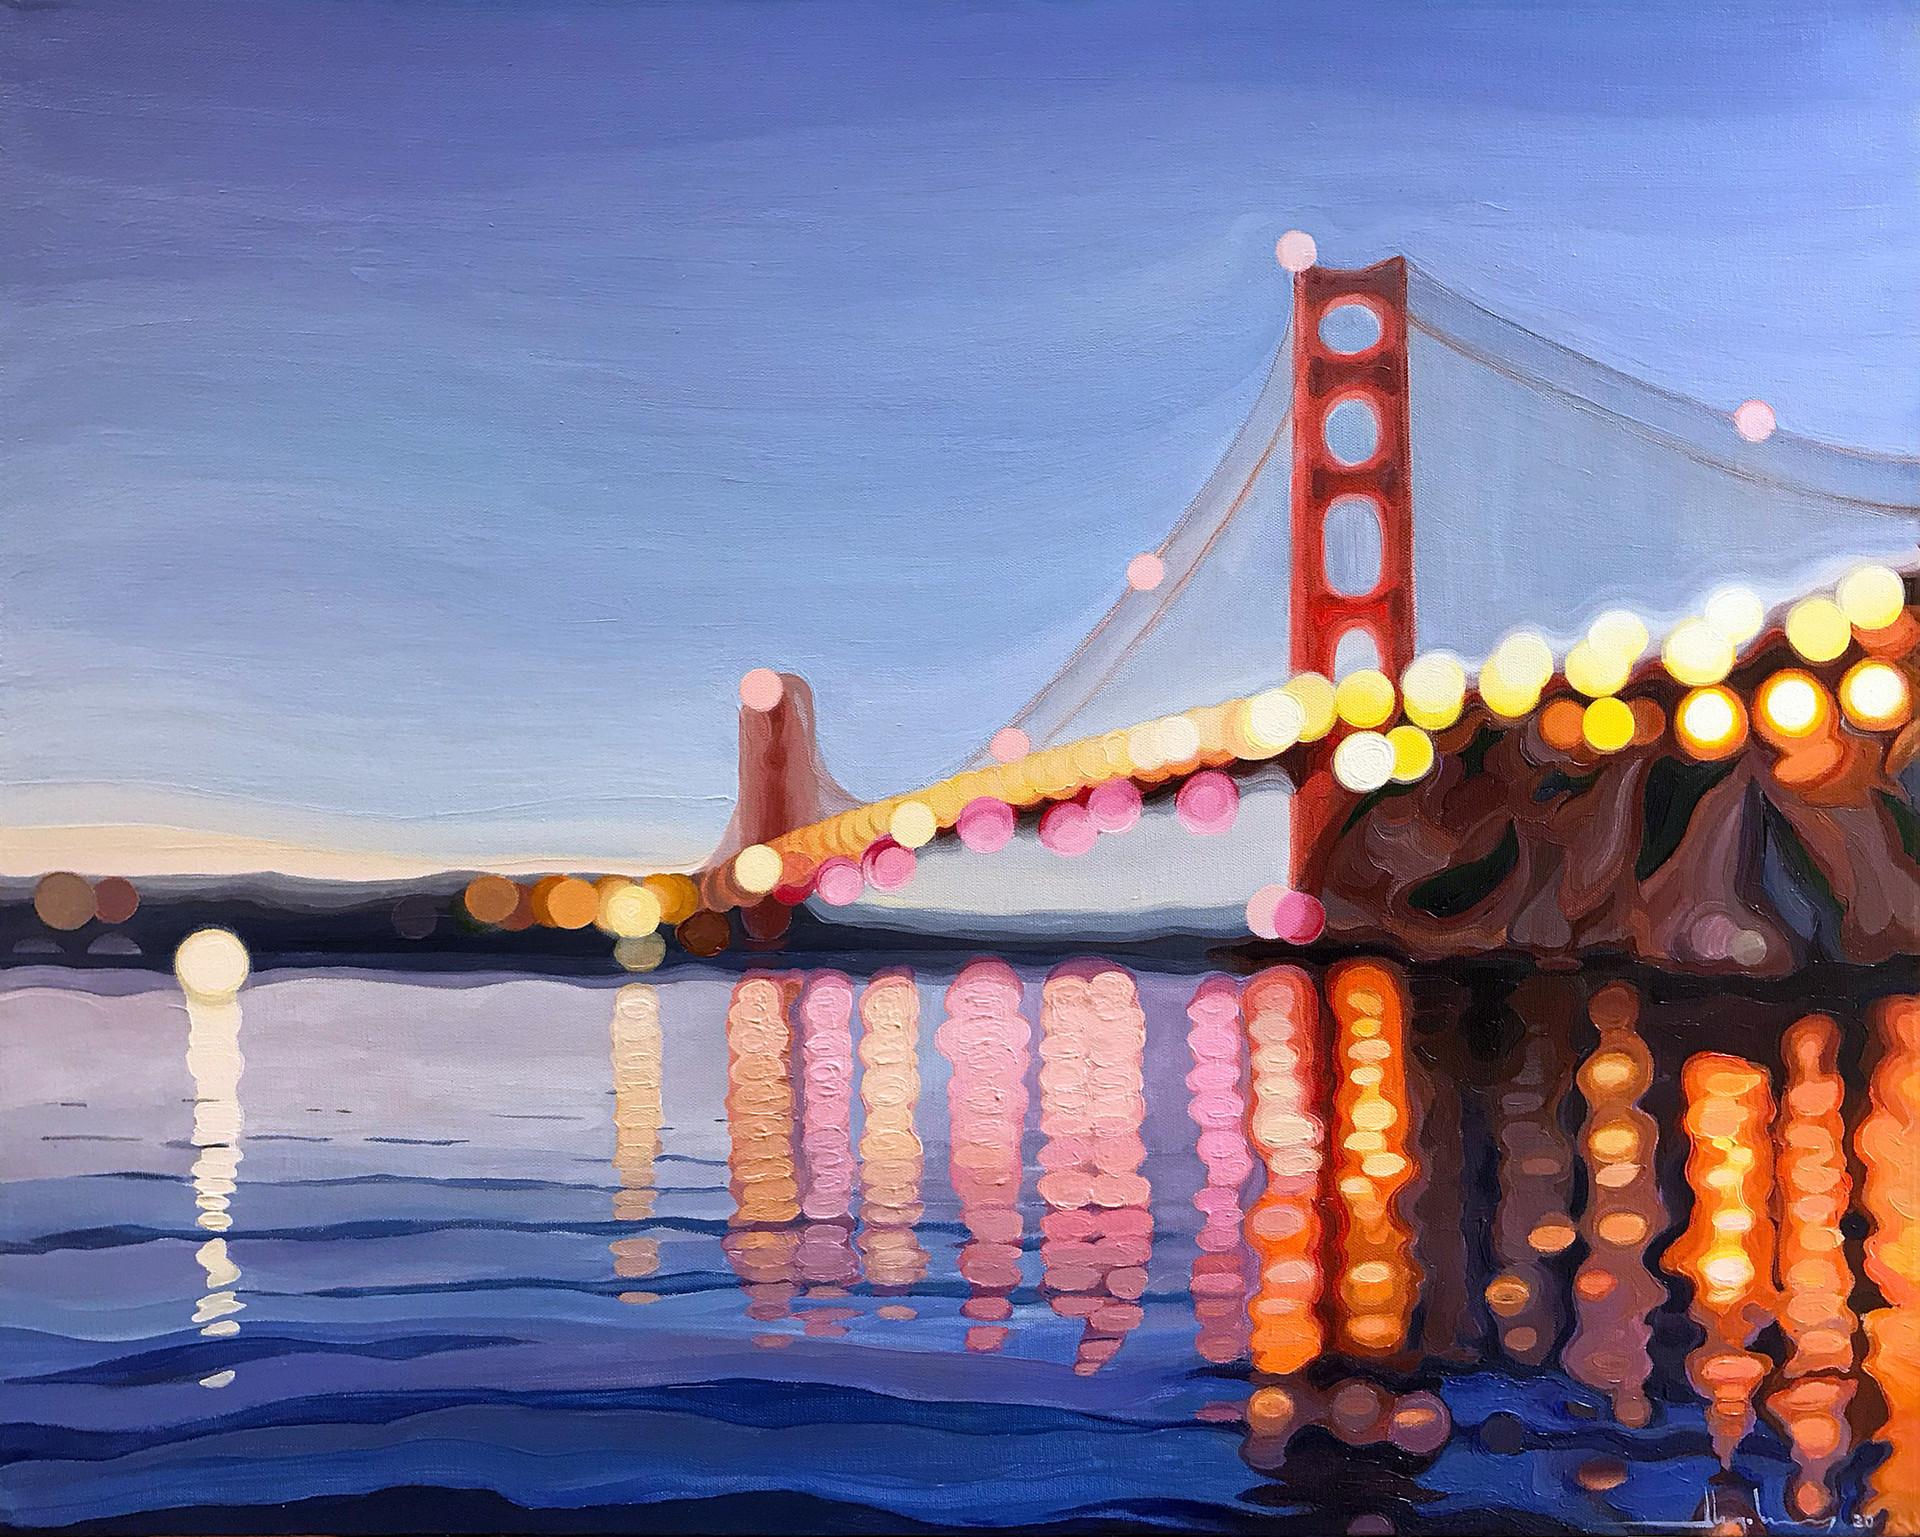 NOCTURNE #24 / Golden Gate Bridge. Sunset.